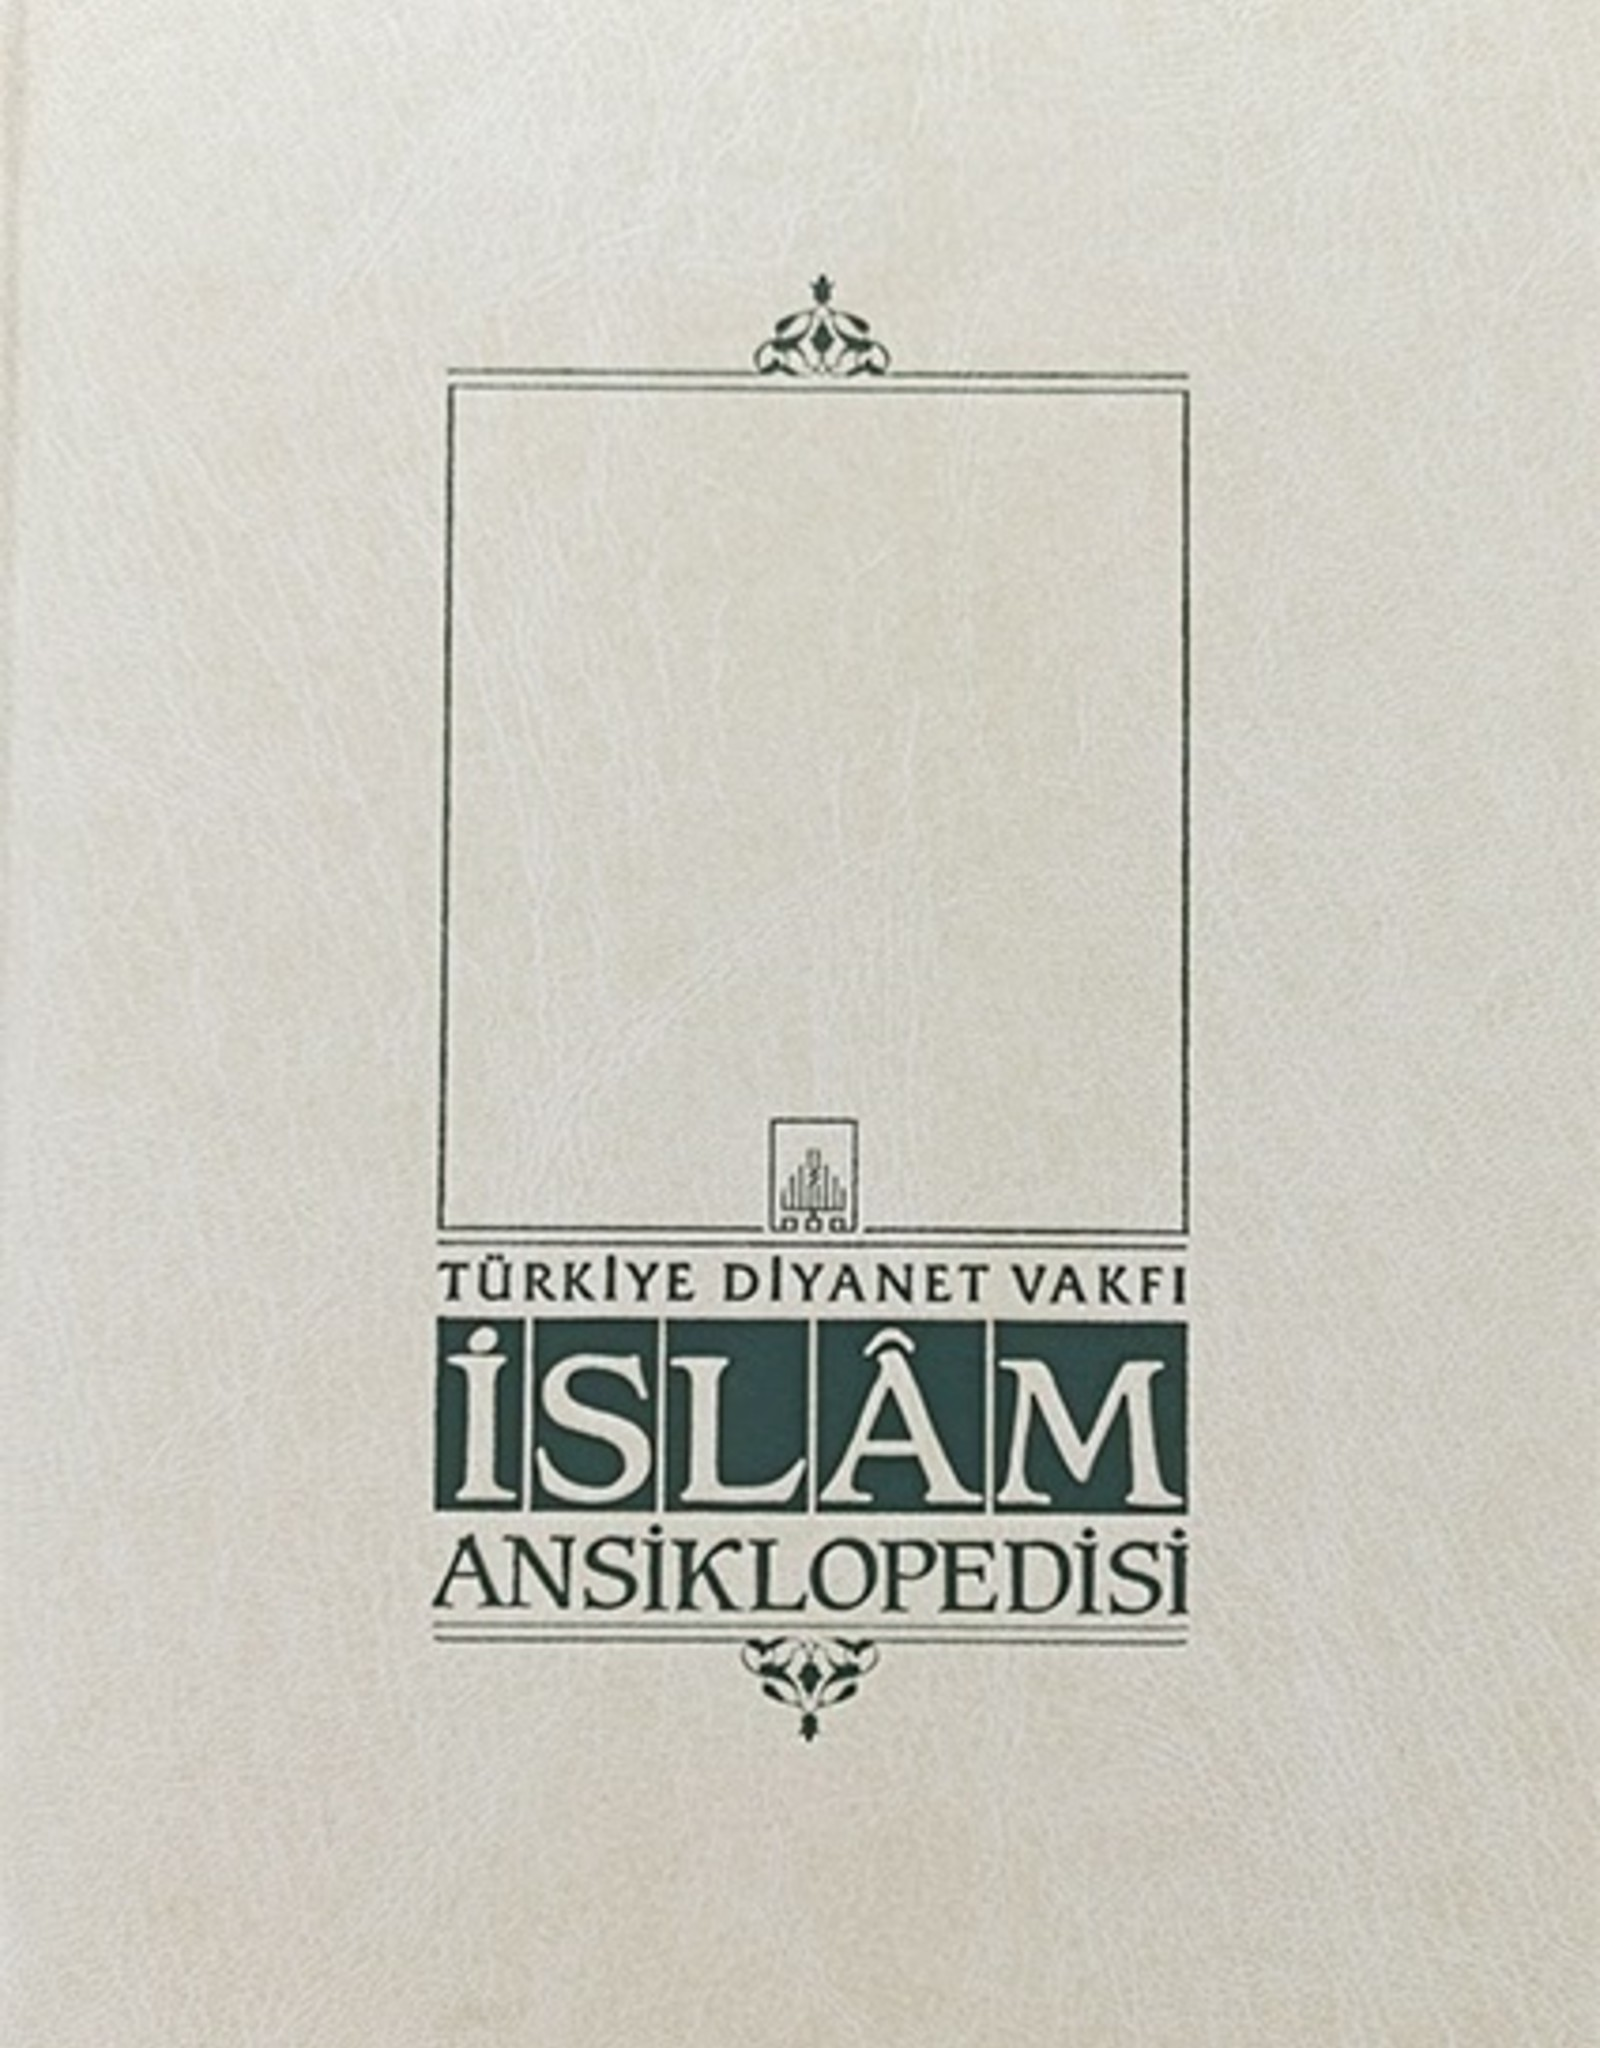 İslam Ansiklopedisi 11. Cilt